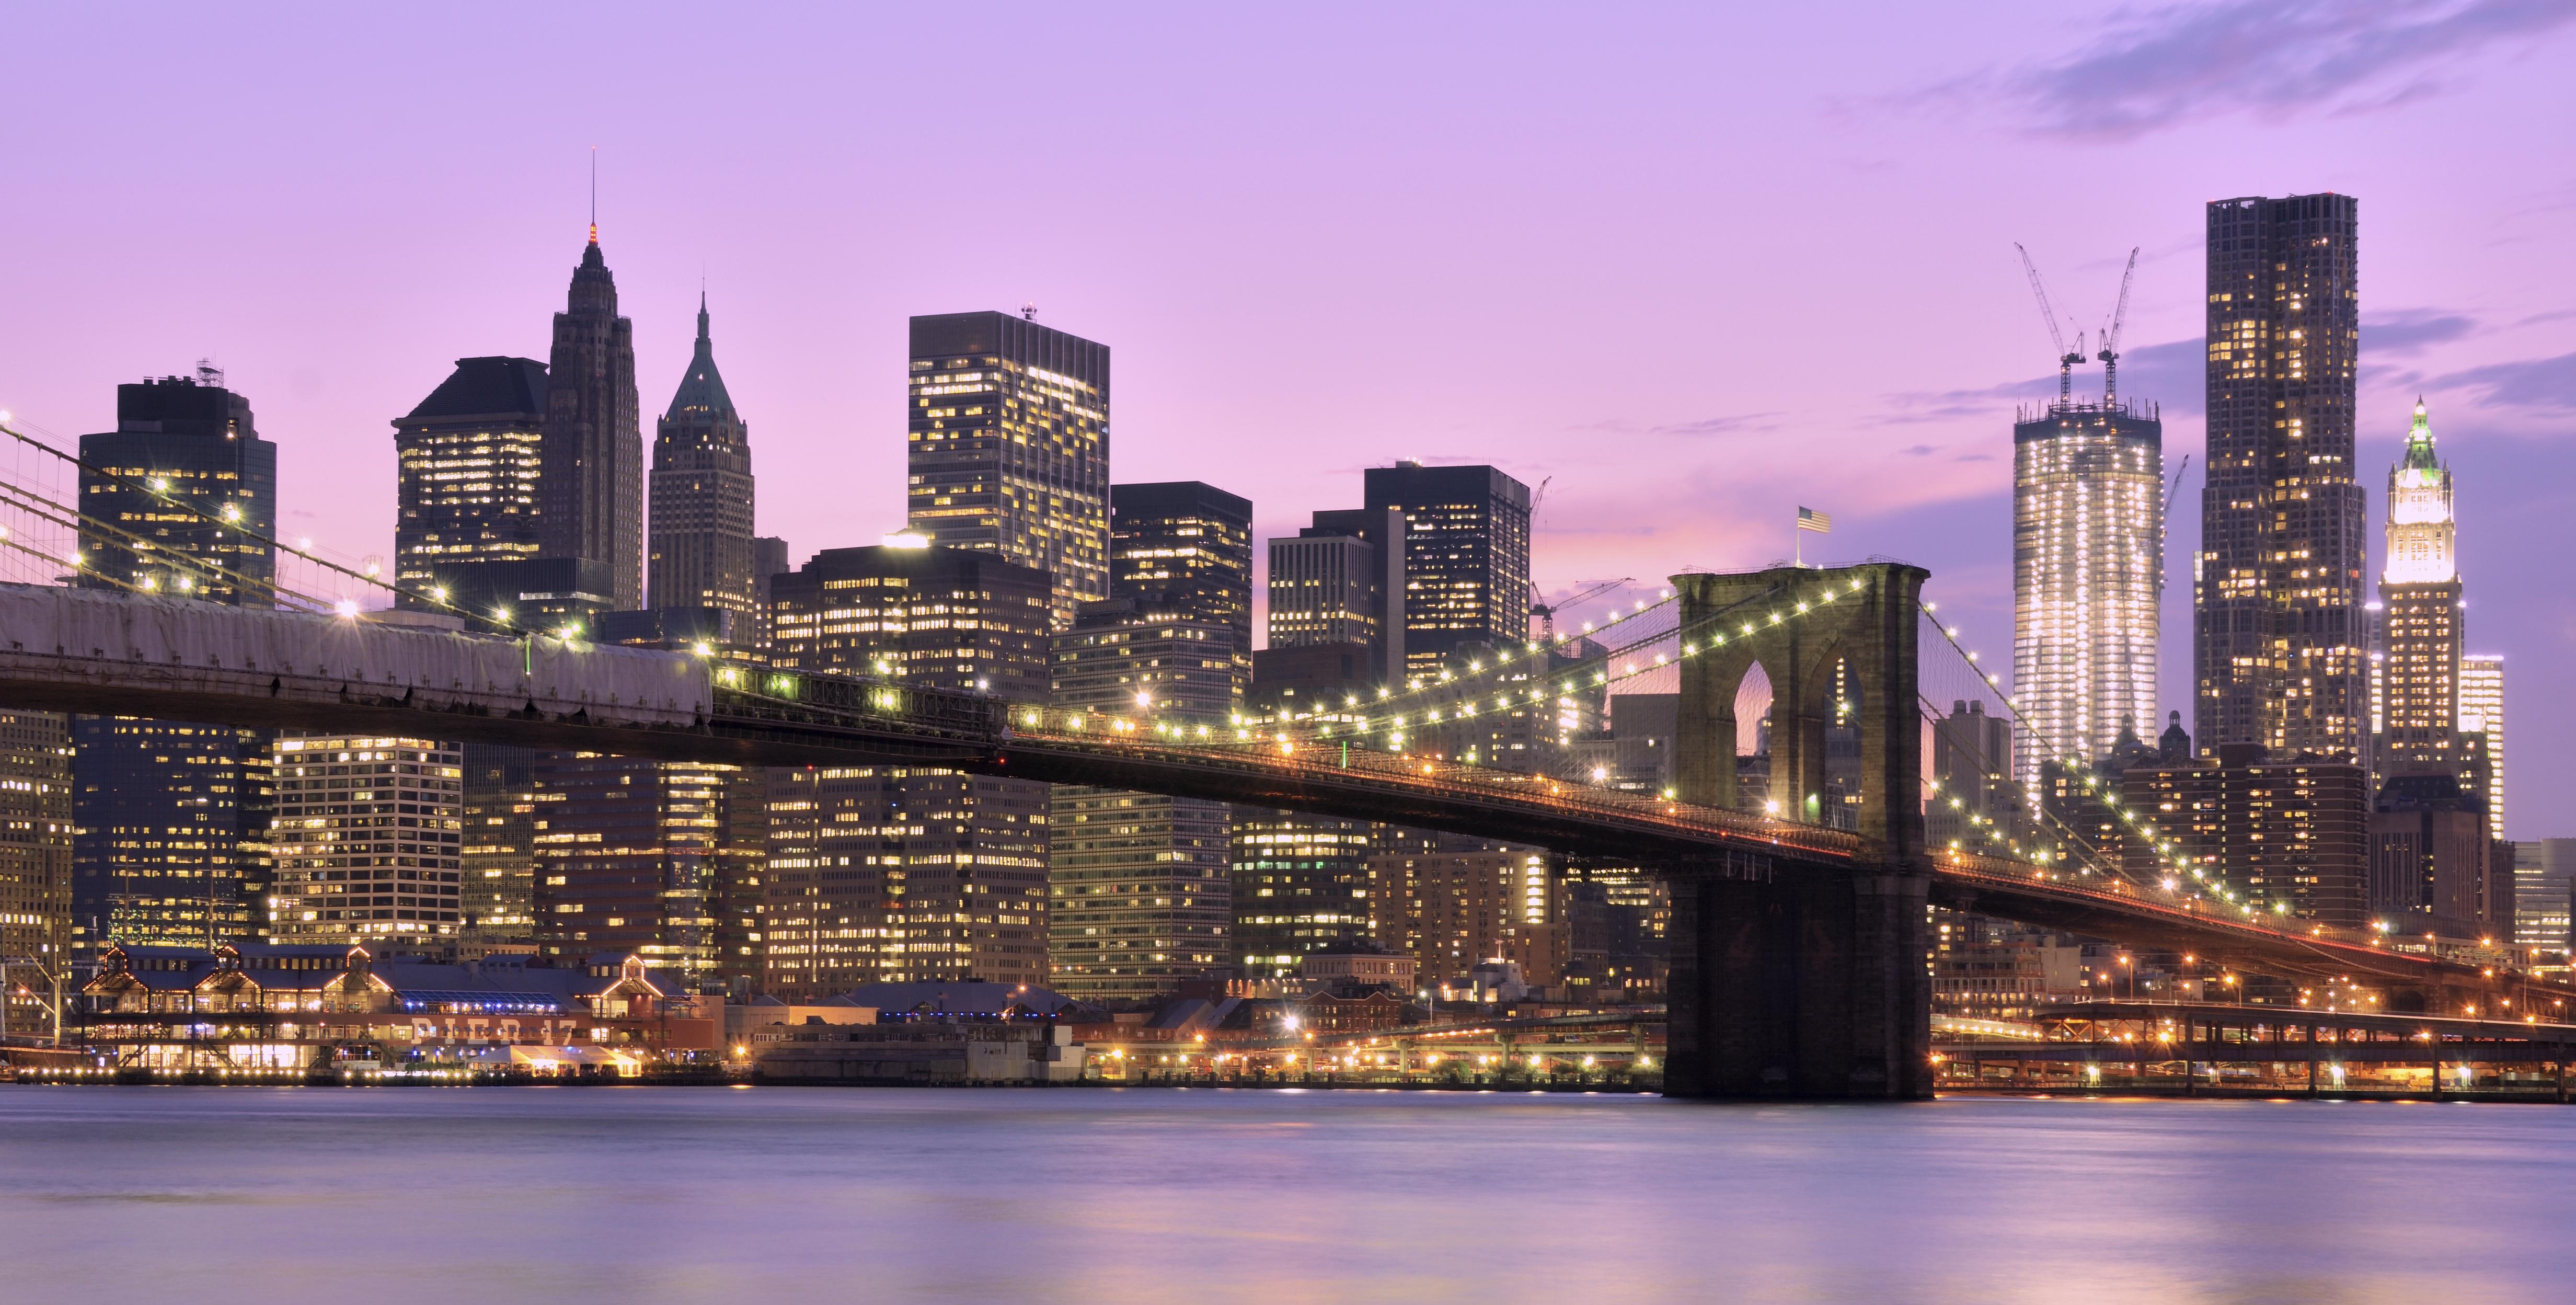 Brooklyn Bridge and Lower Manhattan skyline in New York City.